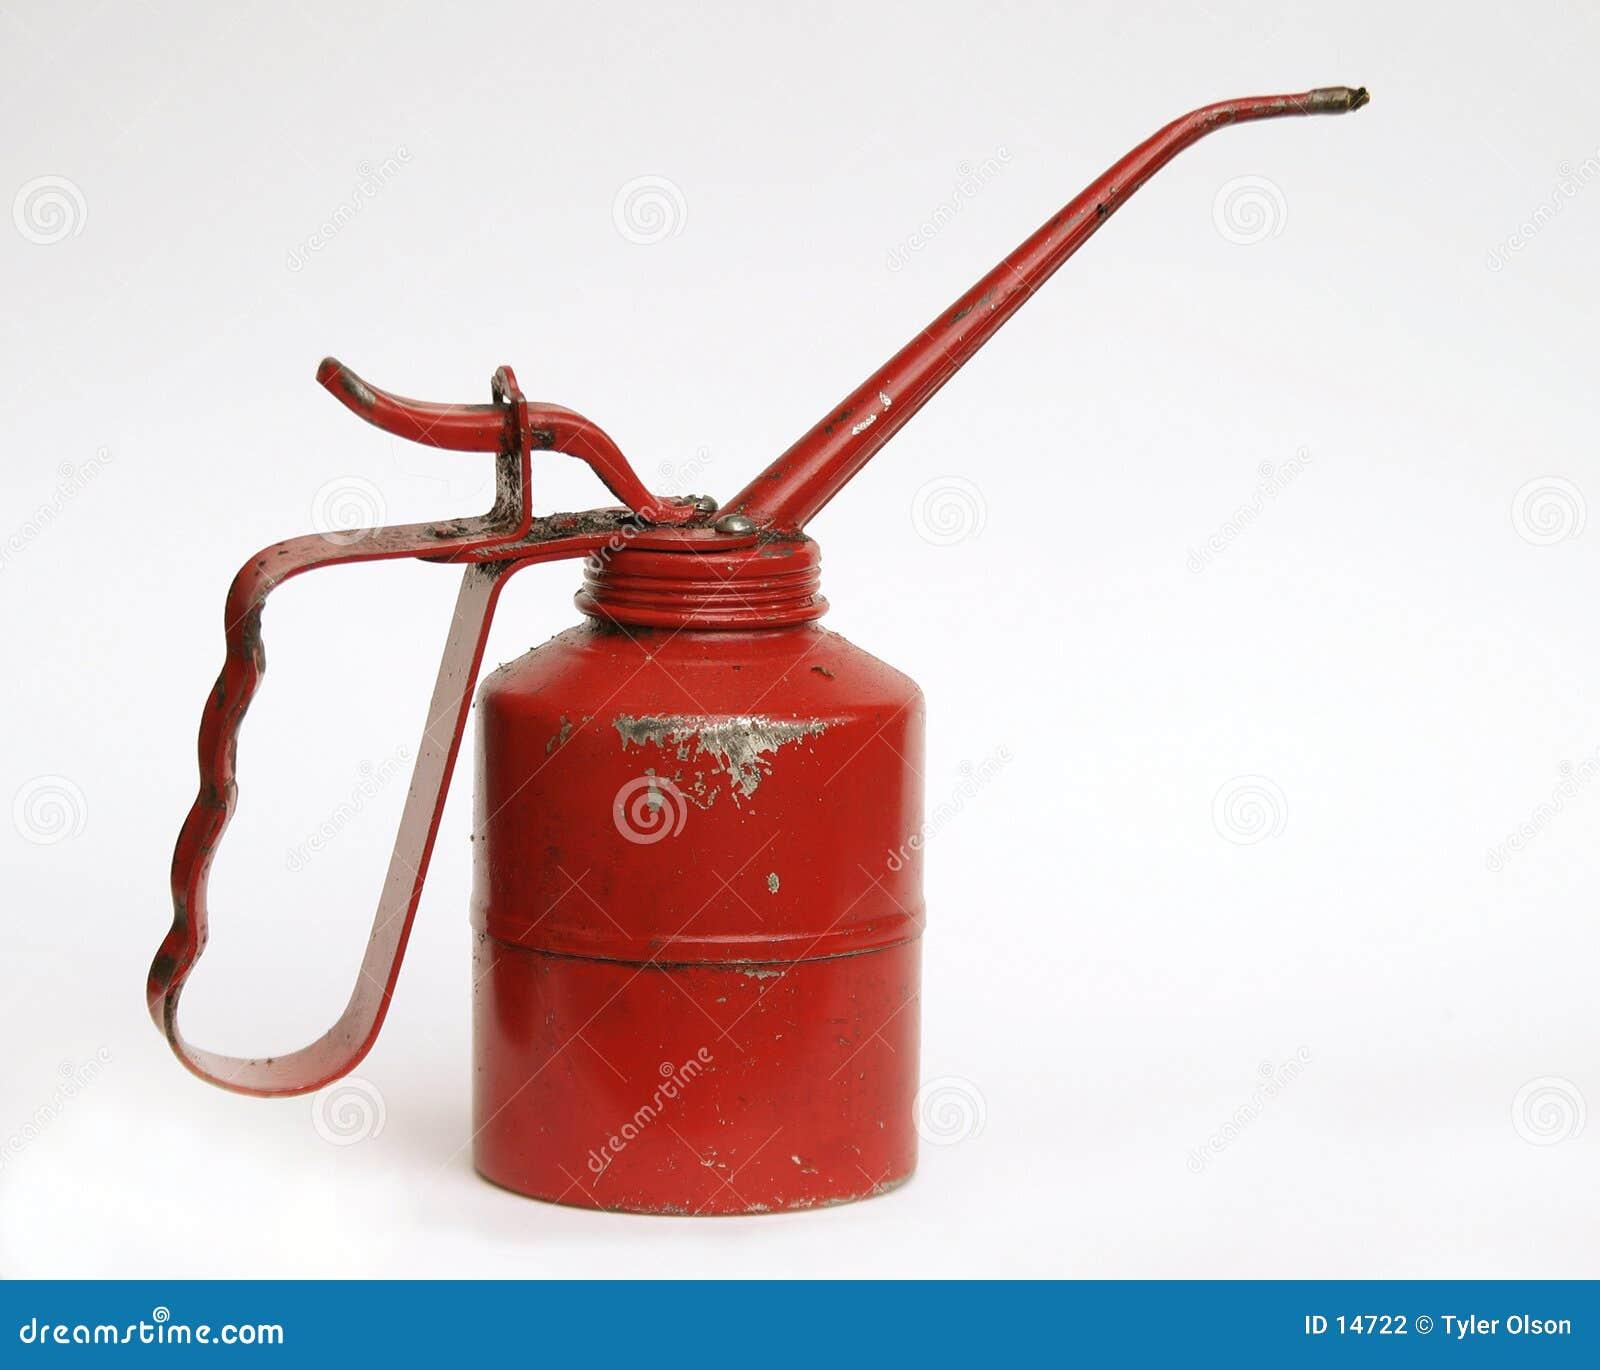 Kan oil red